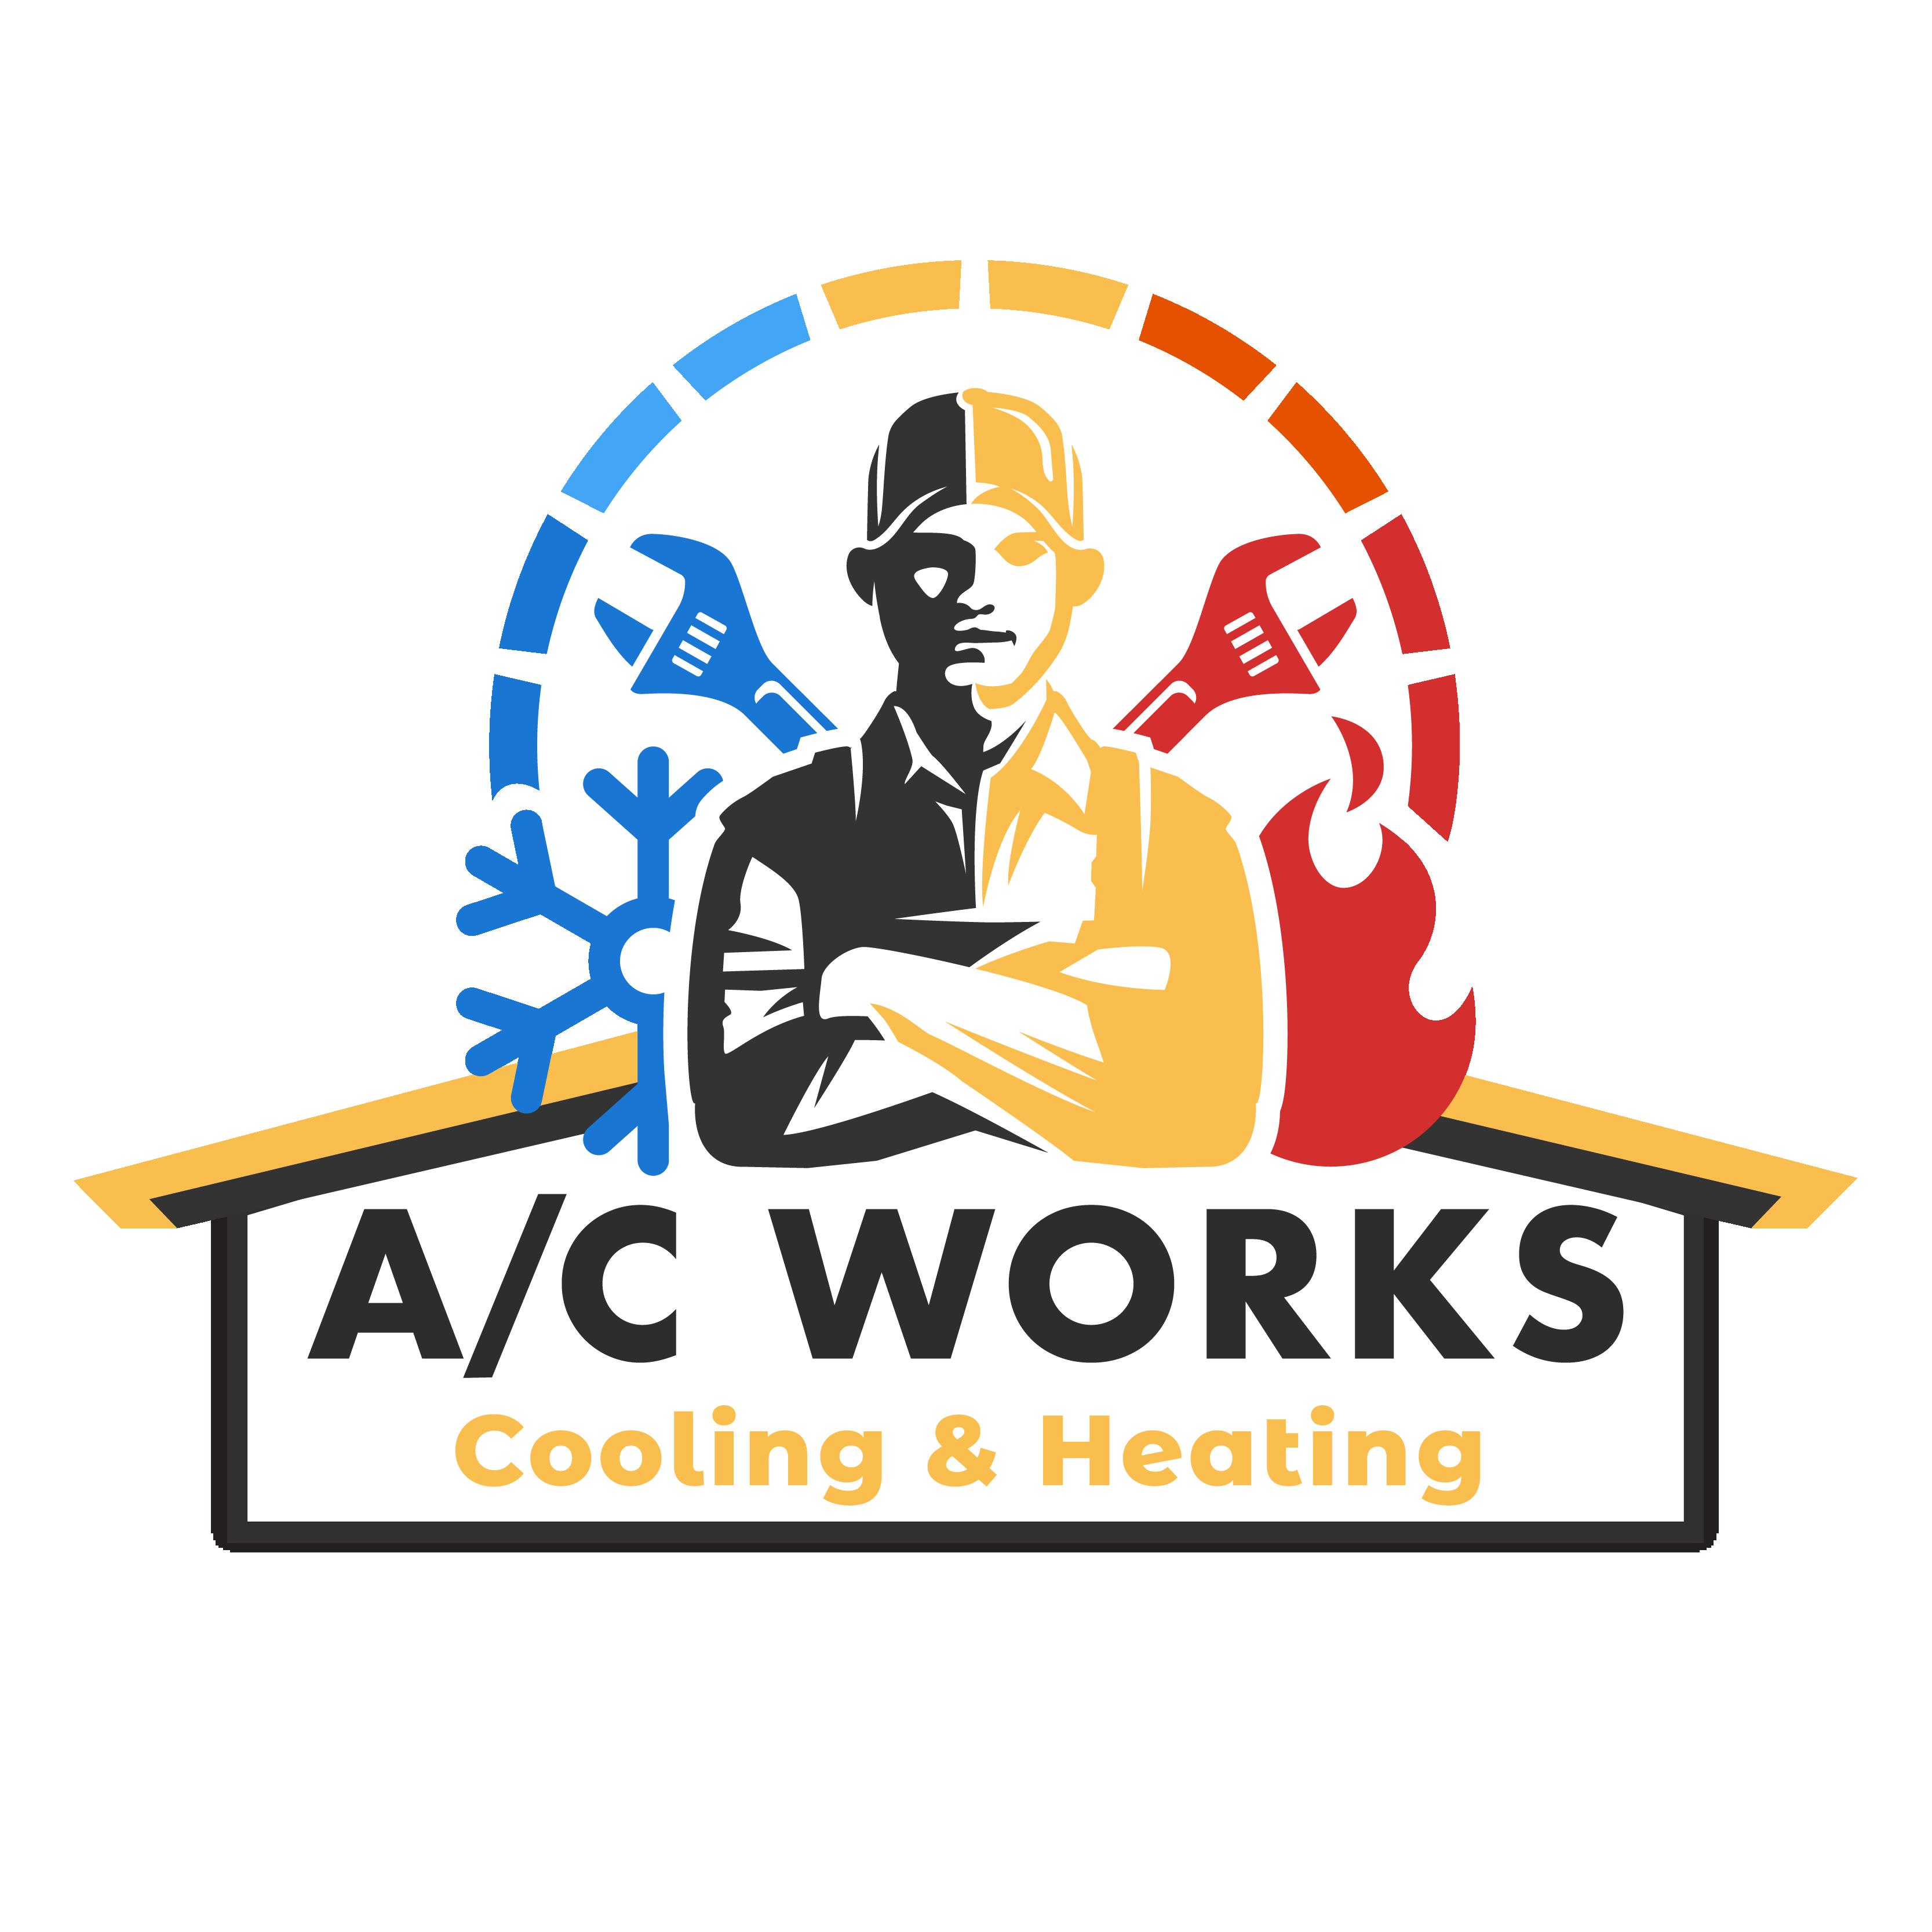 https://acworksaz.com/wp-content/uploads/2021/04/logo-01.png